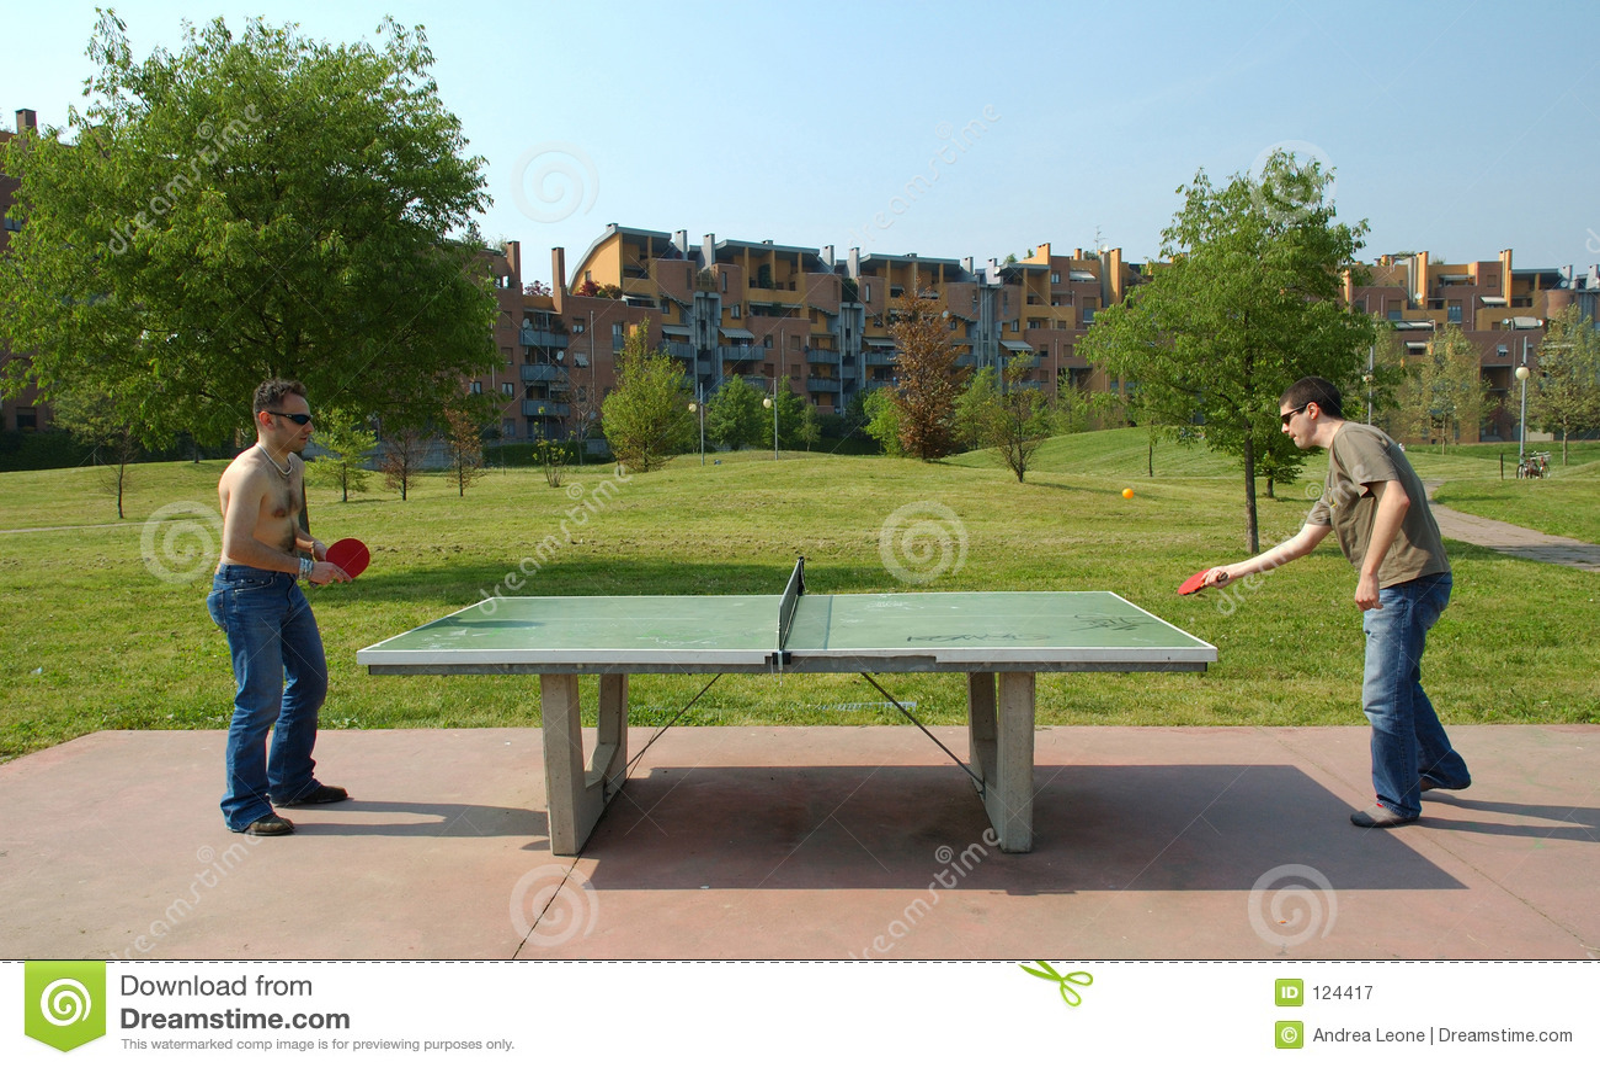 Klingeln Pong